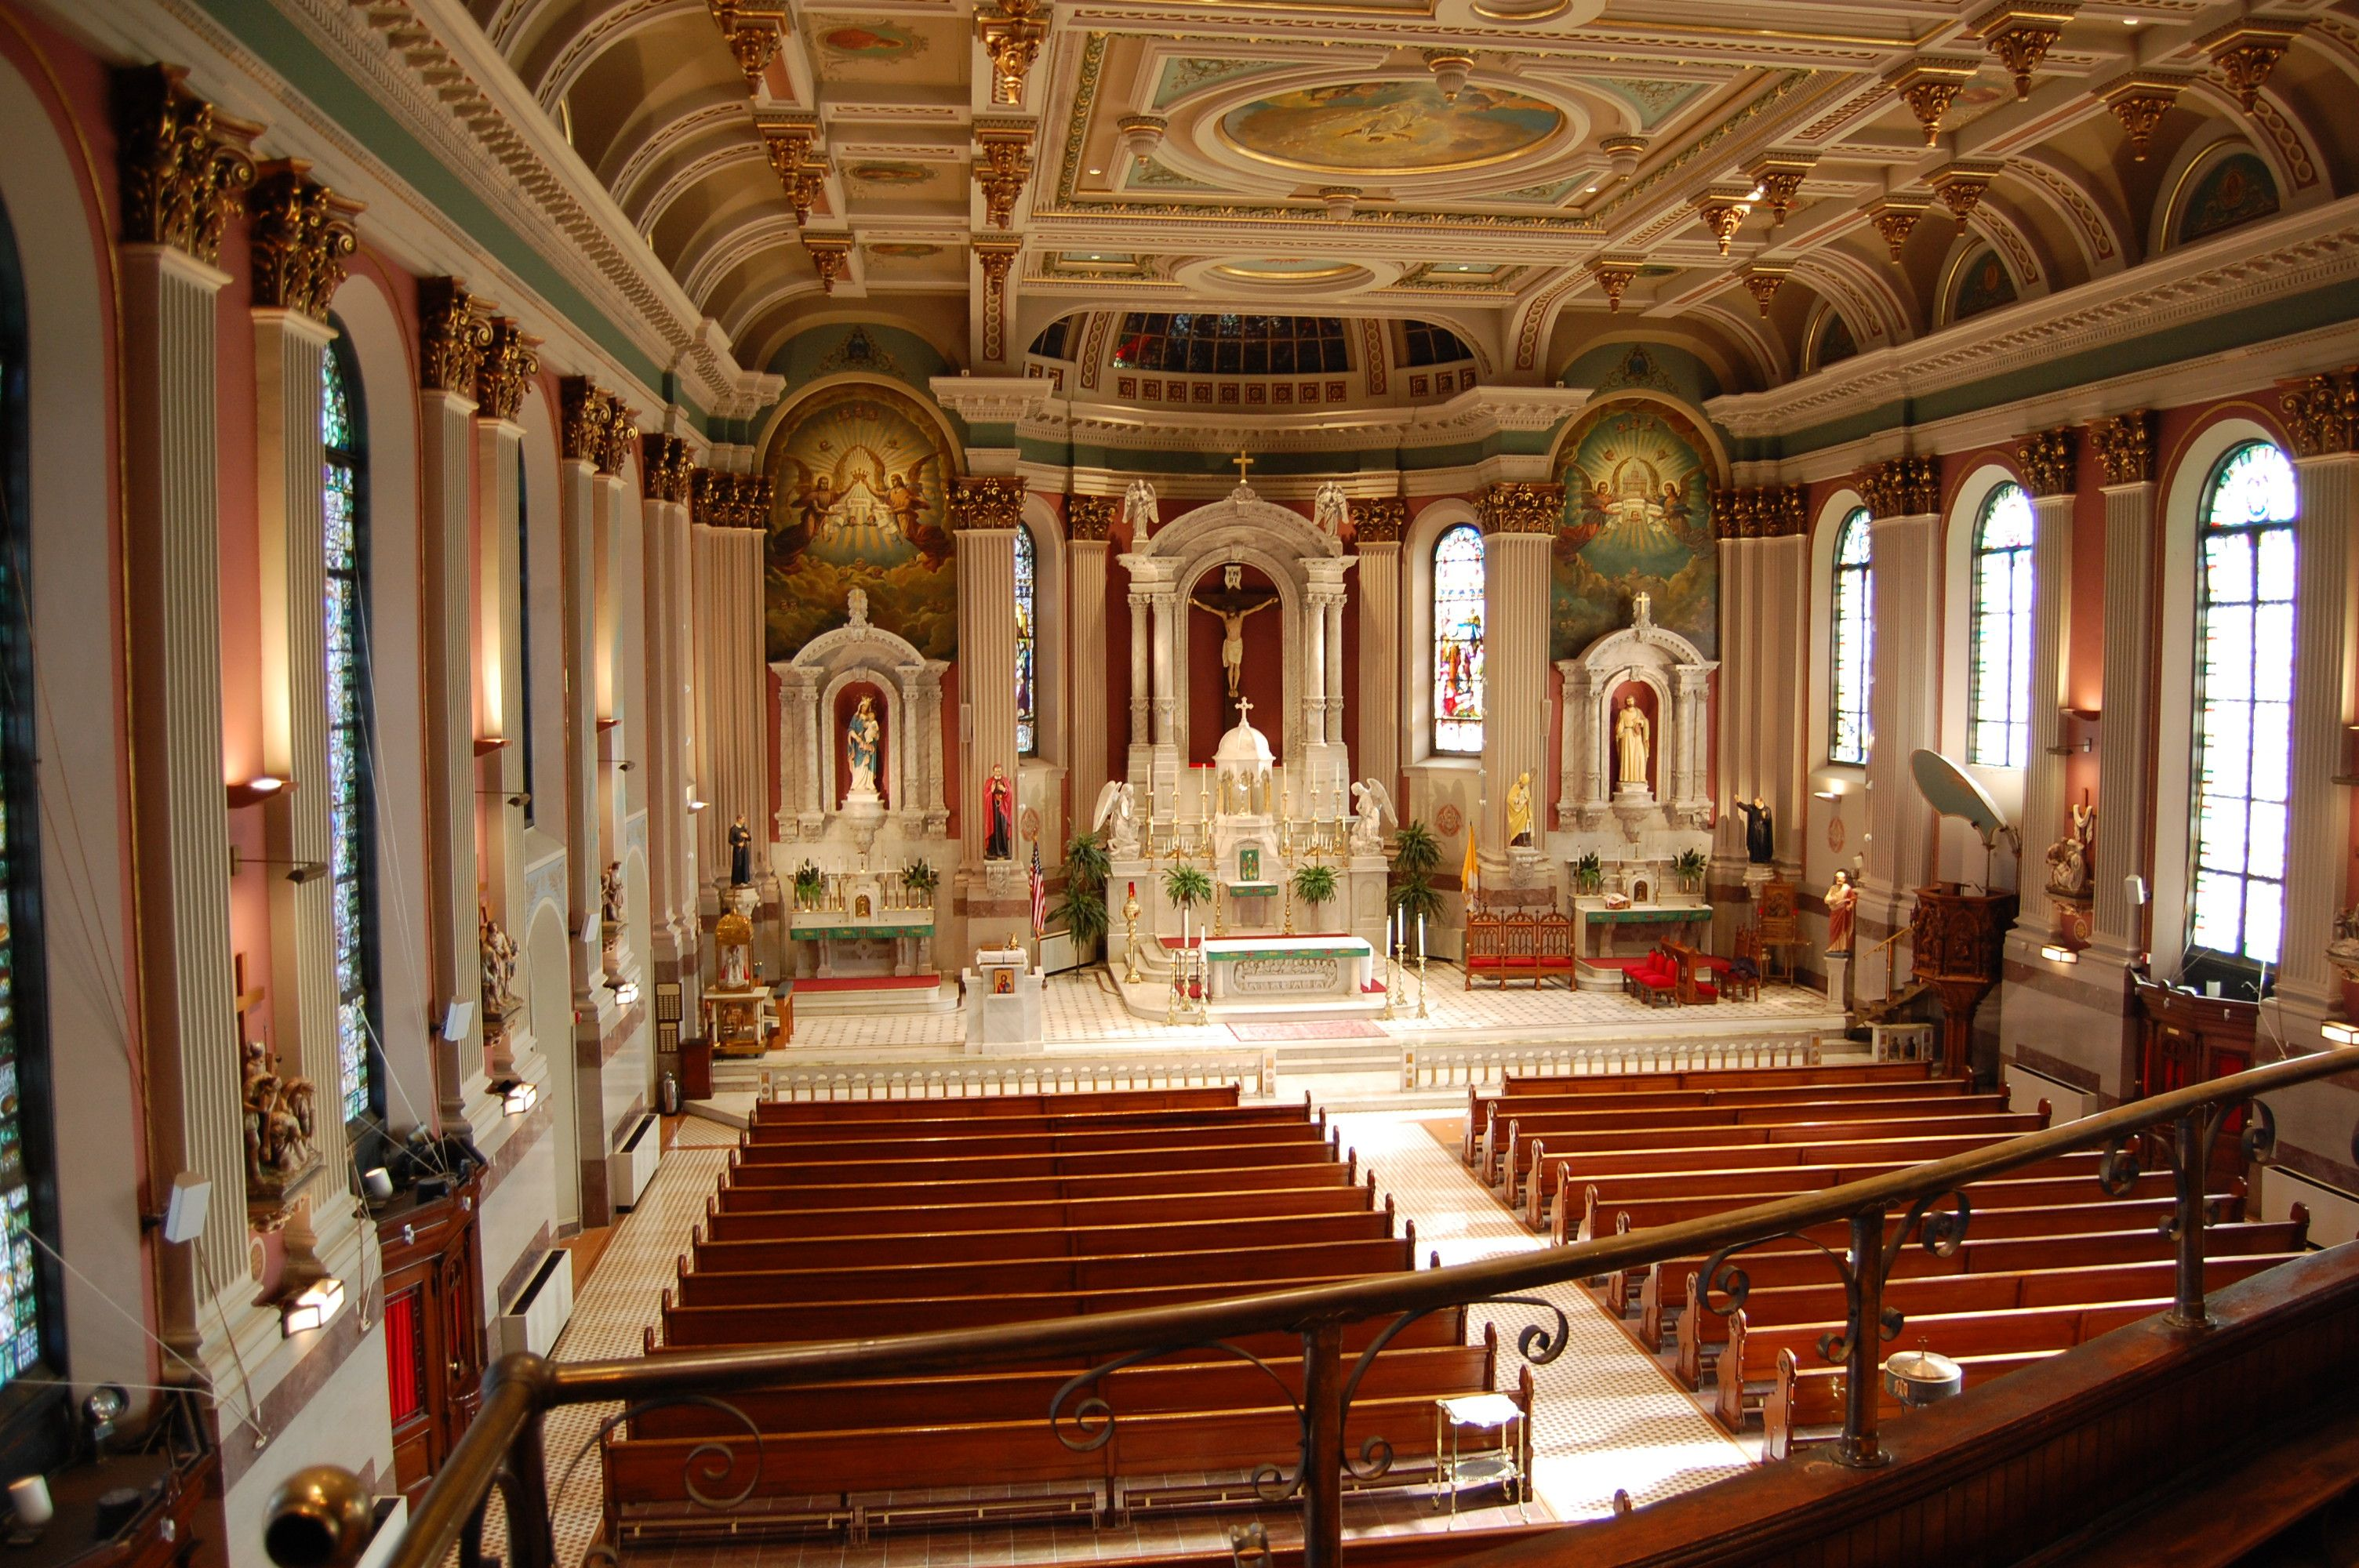 St. Peter the Apostle Church in Philadelphia, Pennsylvania